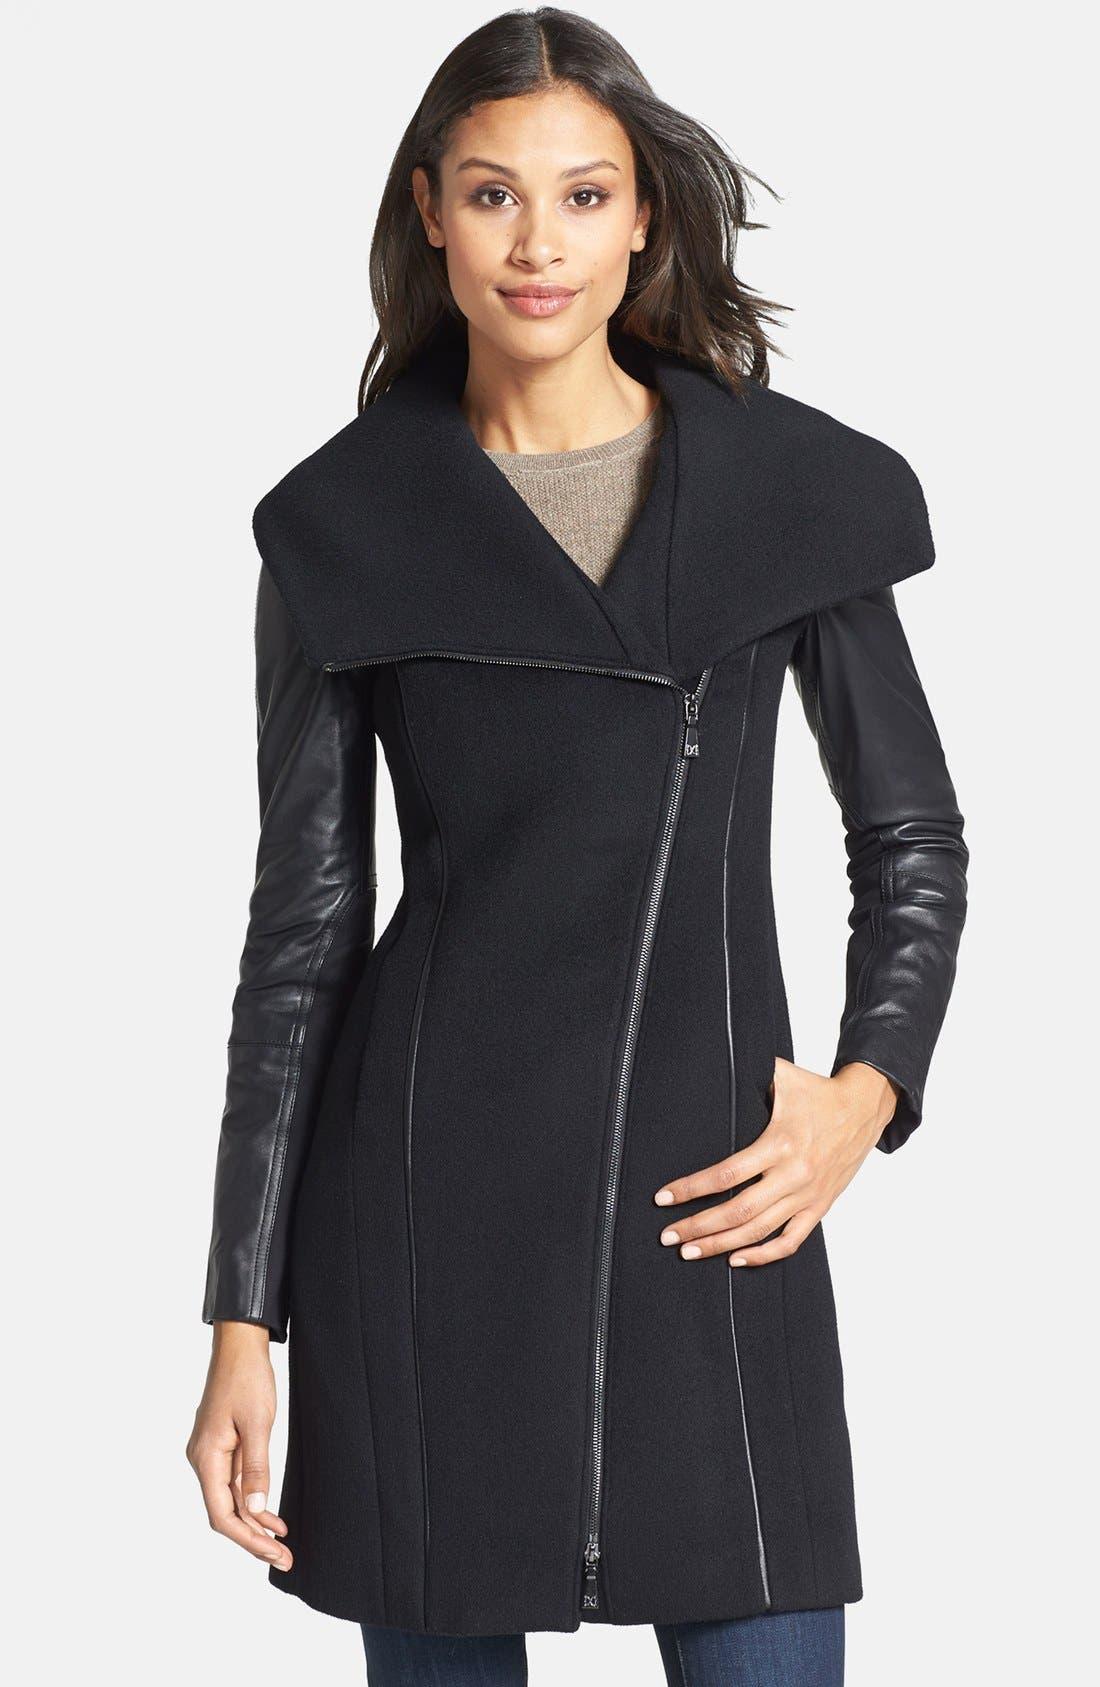 Alternate Image 1 Selected - Dawn Levy 'Serena' Leather Sleeve Asymmetrical Wool Coat